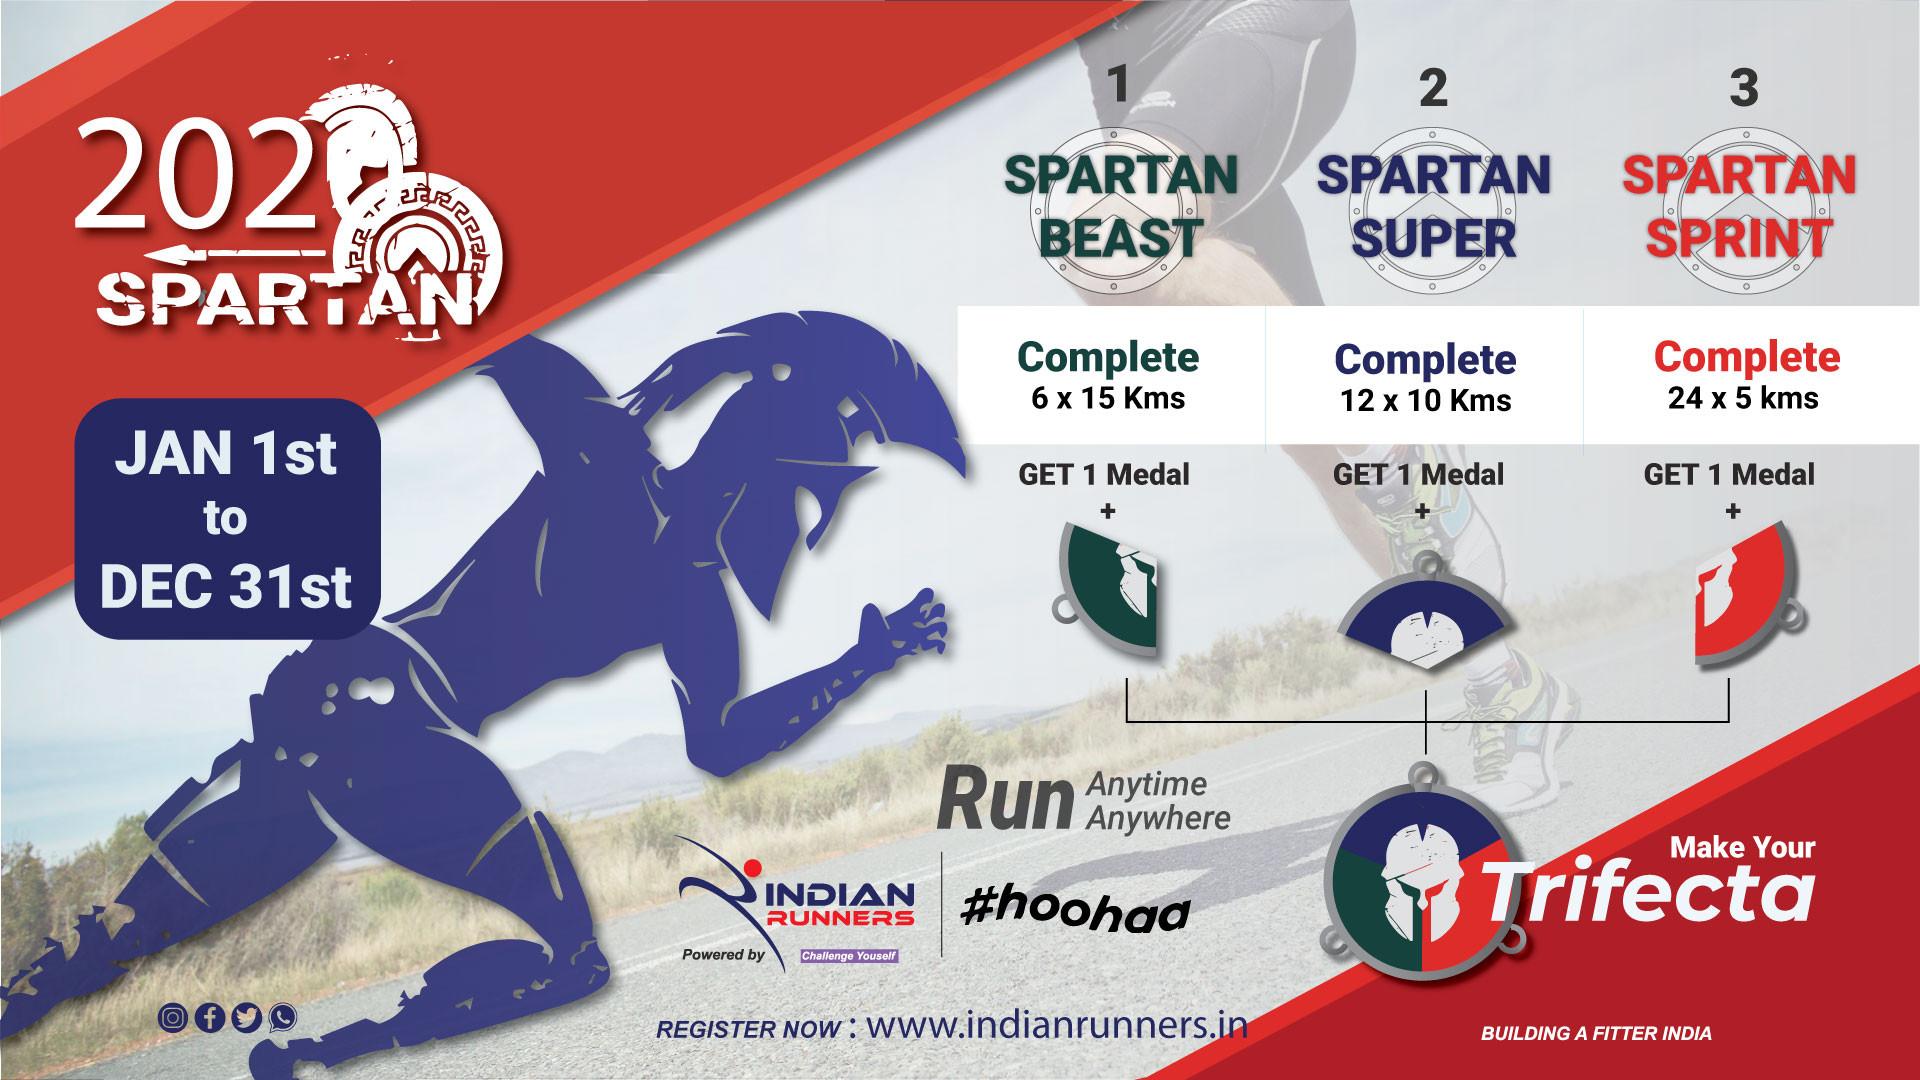 Spartan Trifecta Challenge 2021 image